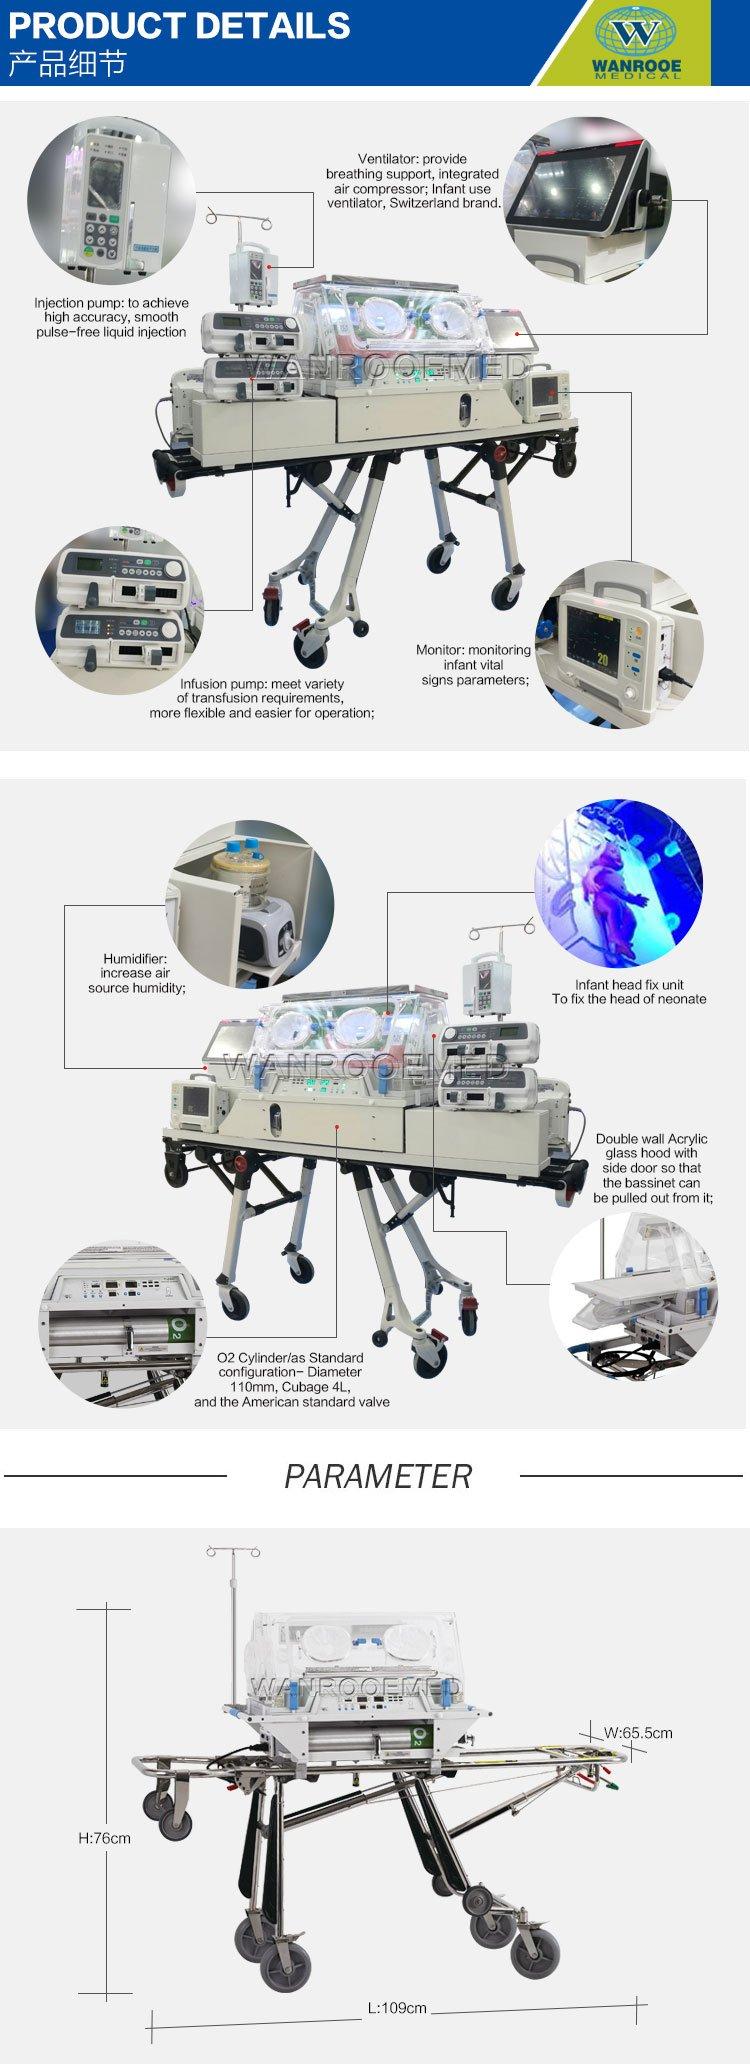 Transport Incubator, Medical Healthcare, Infant Warmer, Baby Incubator, Medical Infant Incubator, Baby Care Infant Incubator